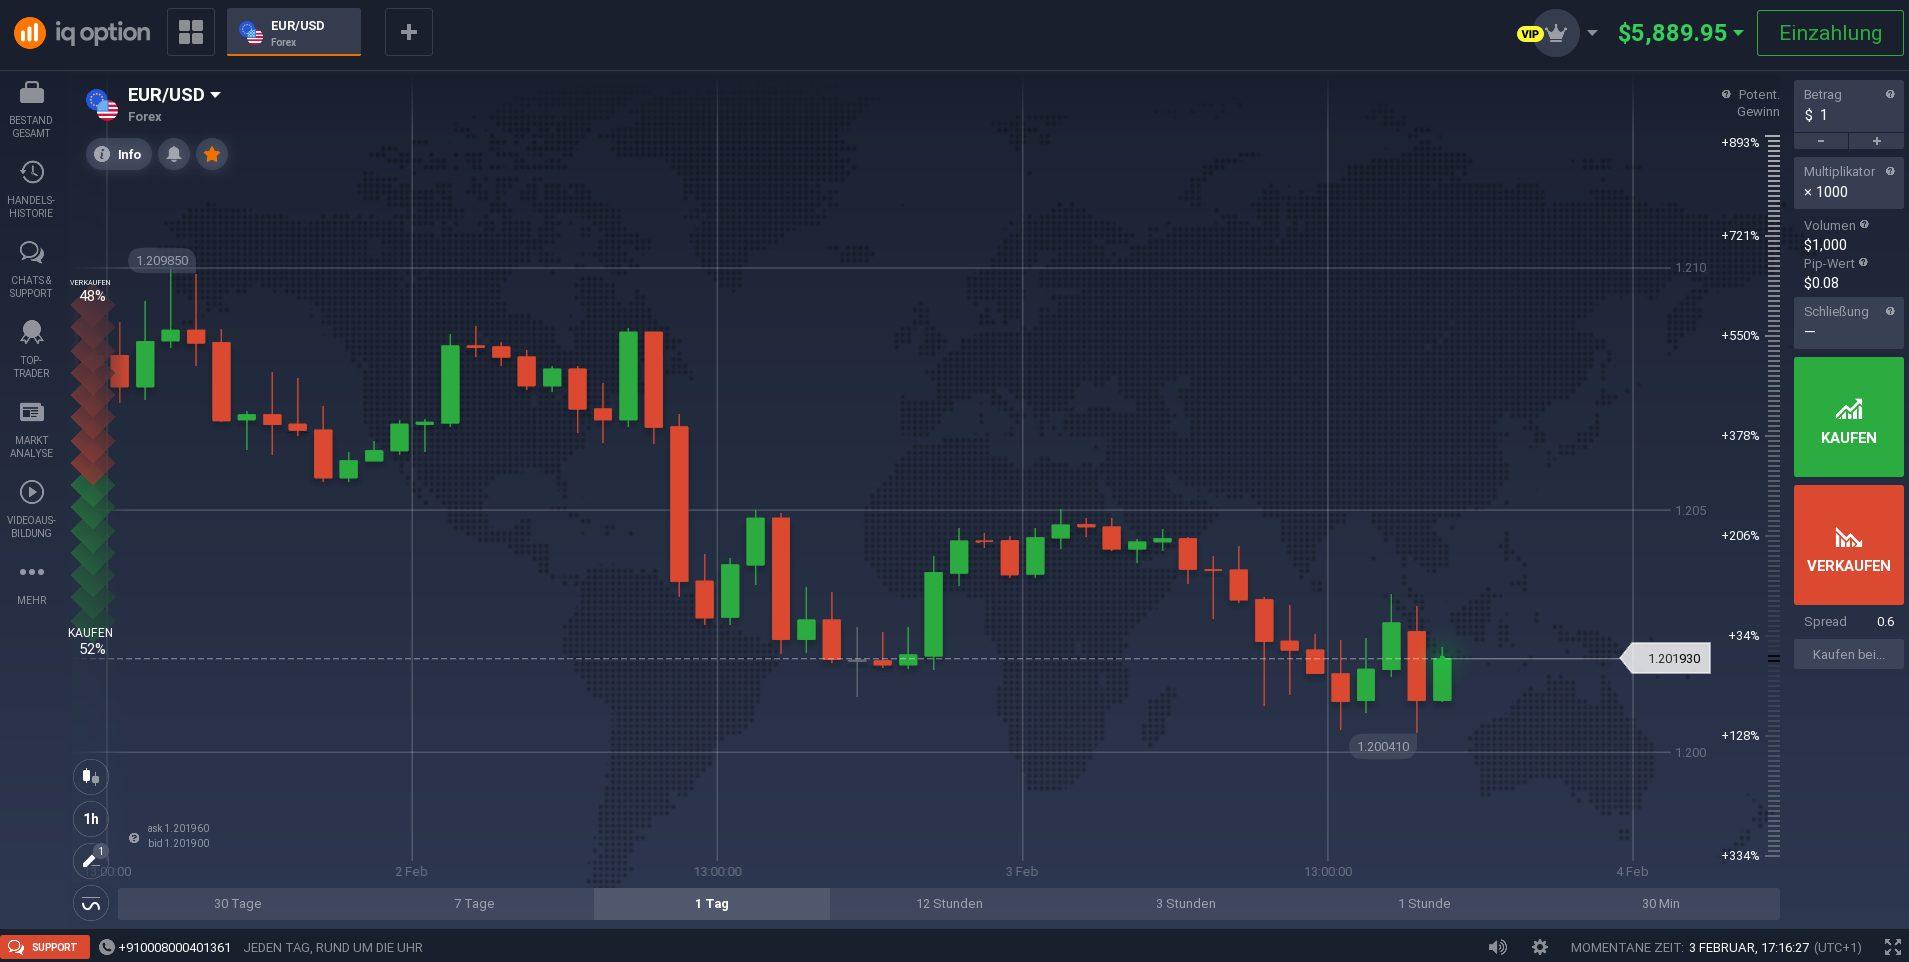 Trading Plattform von IQ Option